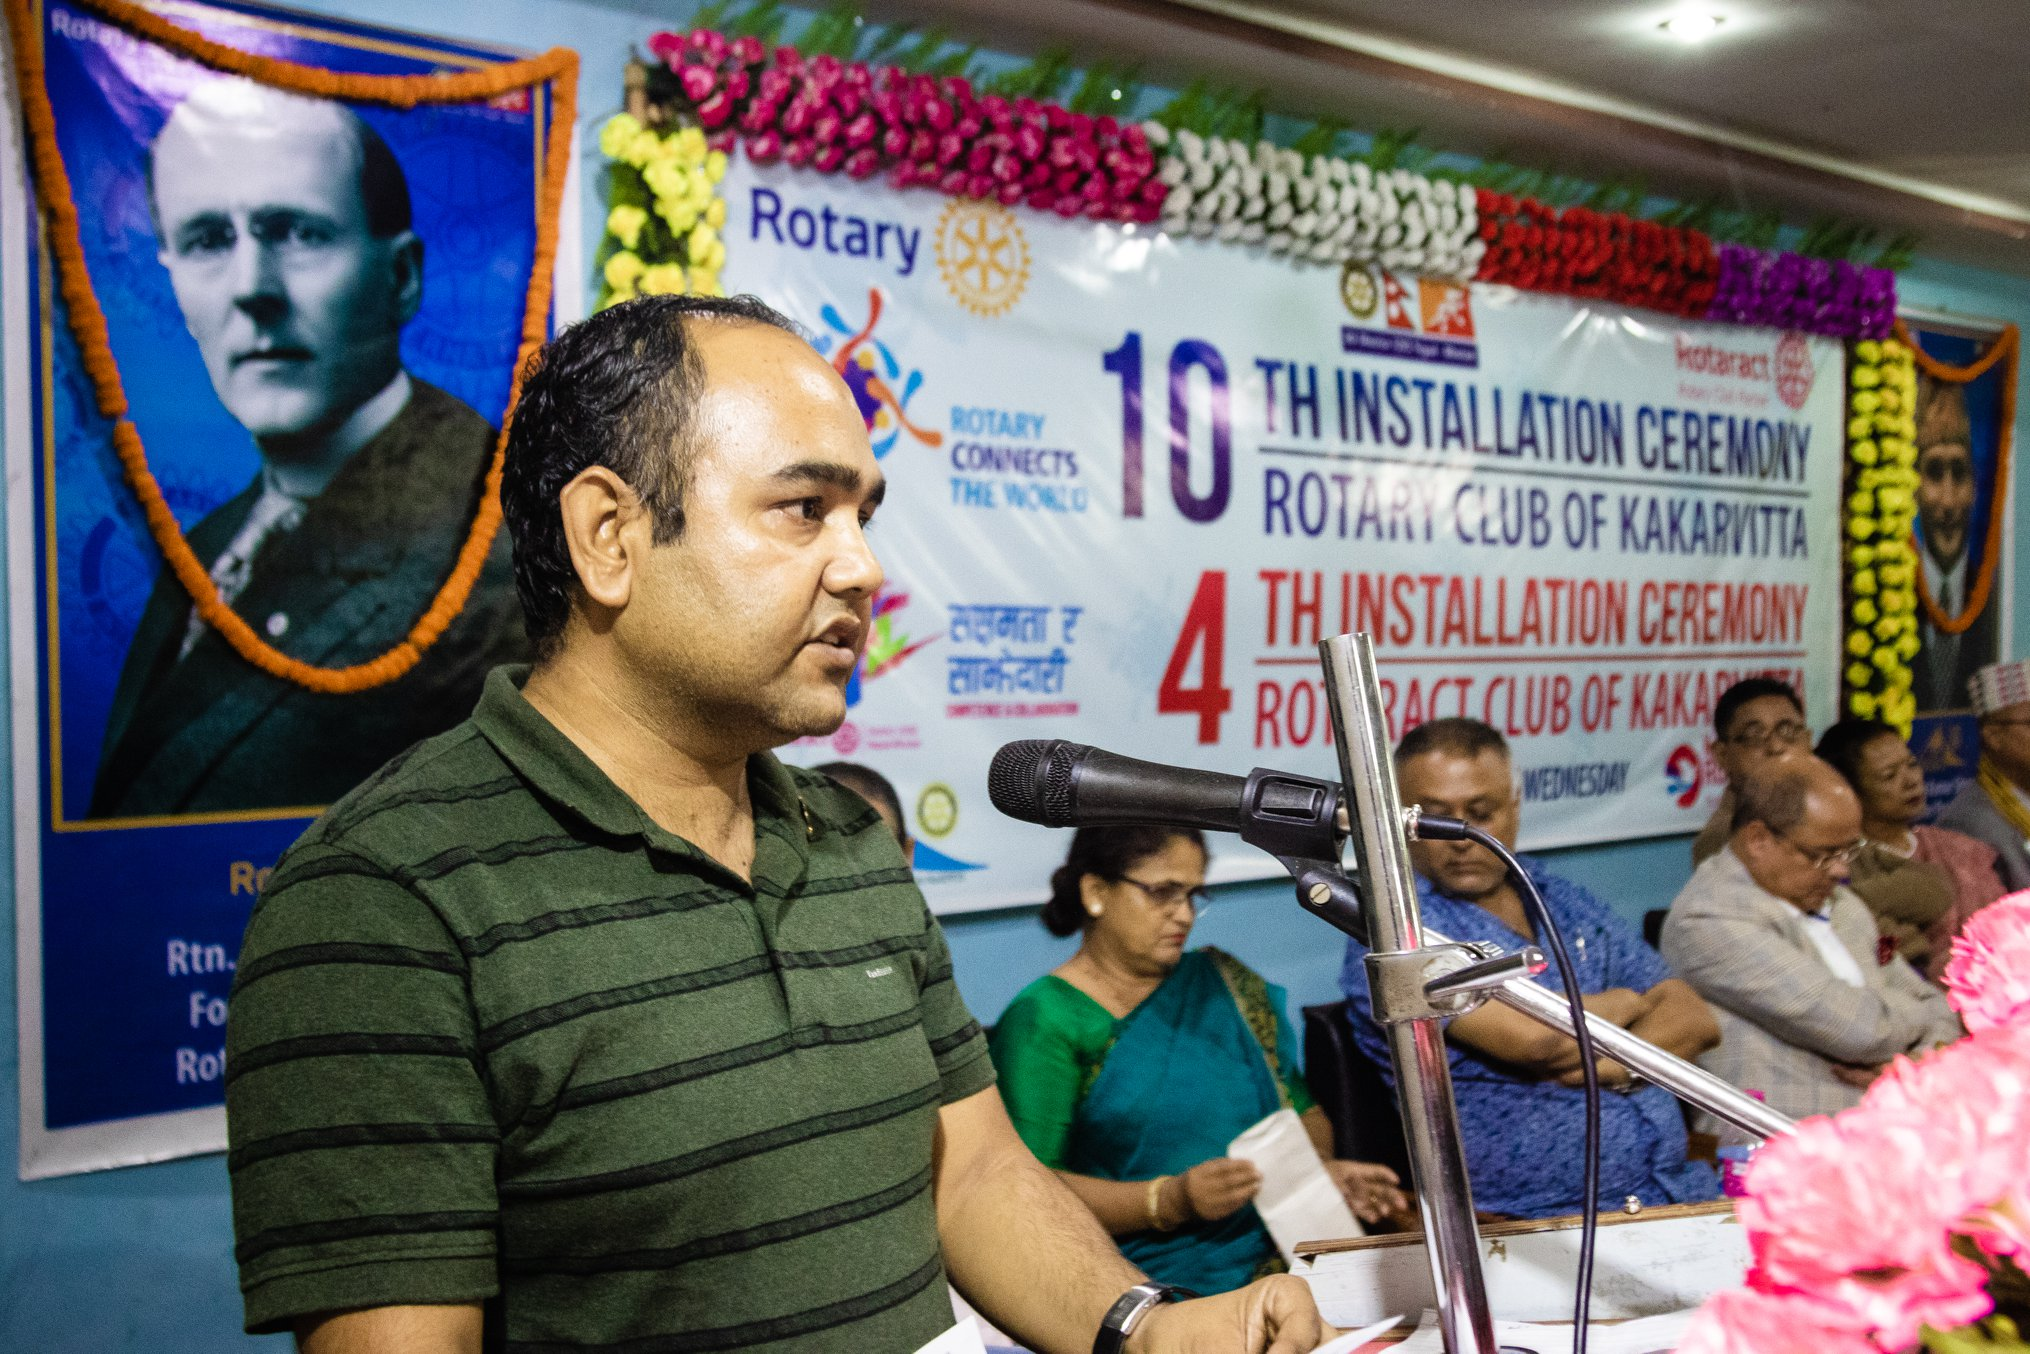 10th Installation Ceremony Rotary Club Of Kakarvitta 46